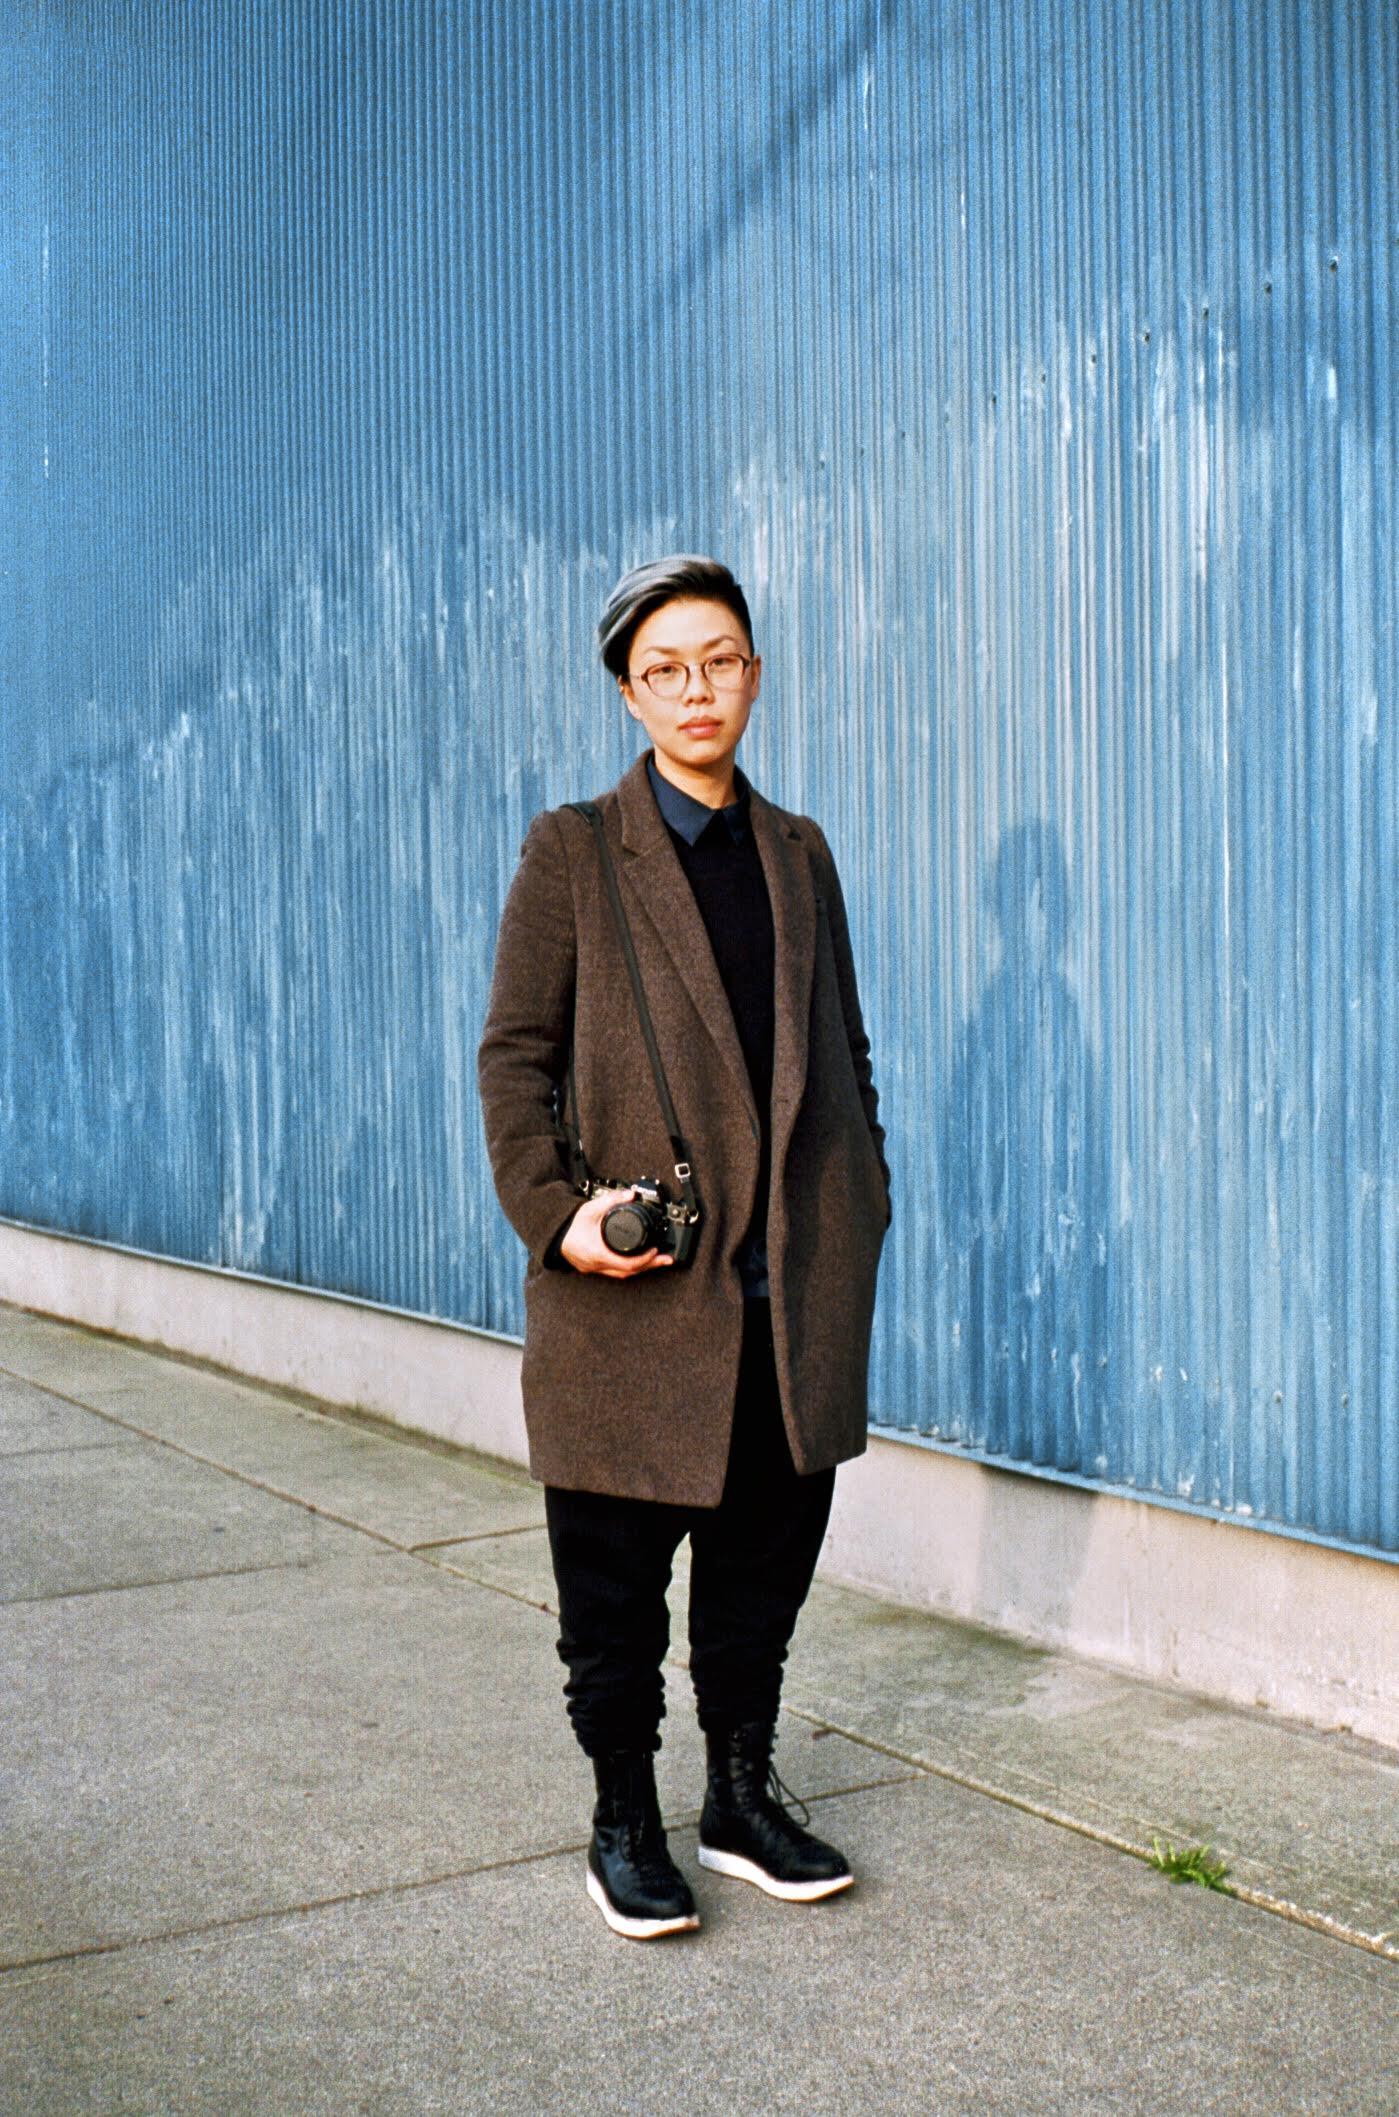 Jo Shin headshot - blue background